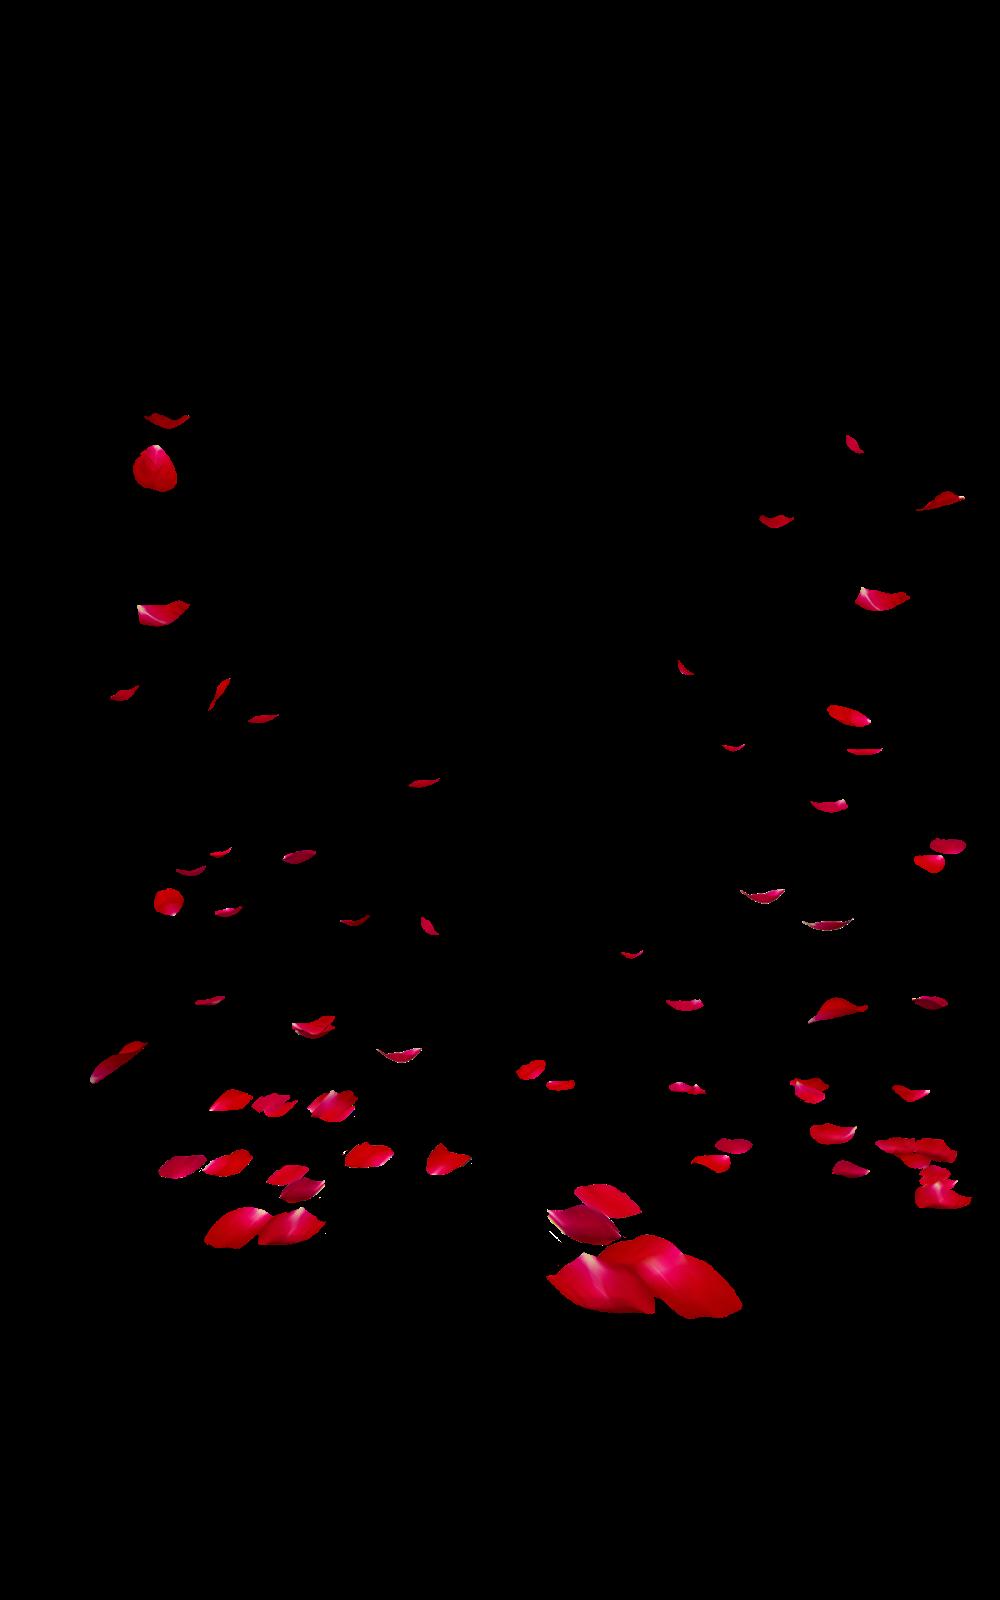 Falling Rose Petals Transparent Images PNG PNG, SVG Clip ...